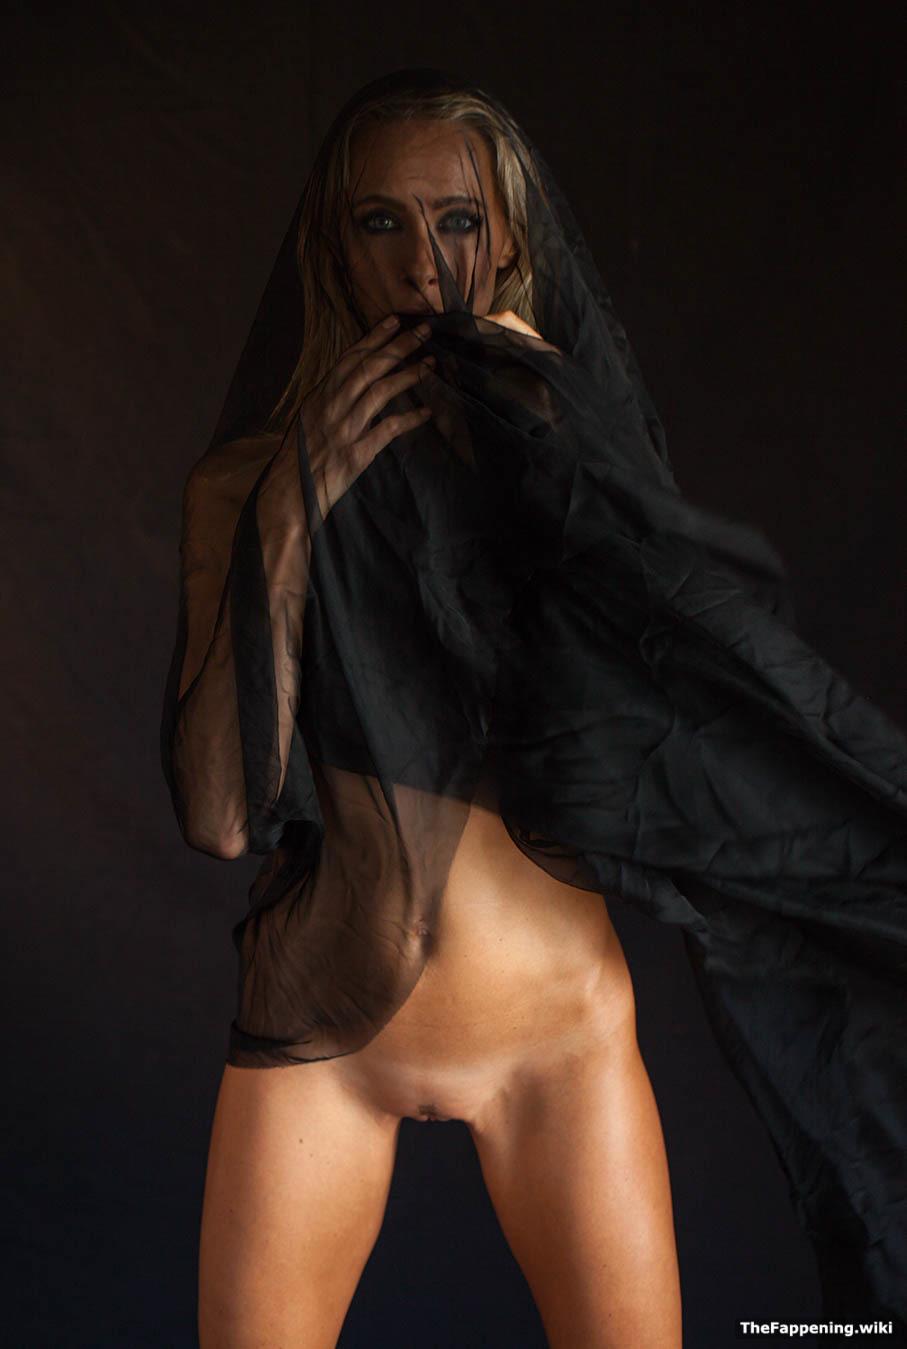 Avril lavigne sex tape - 2 part 3